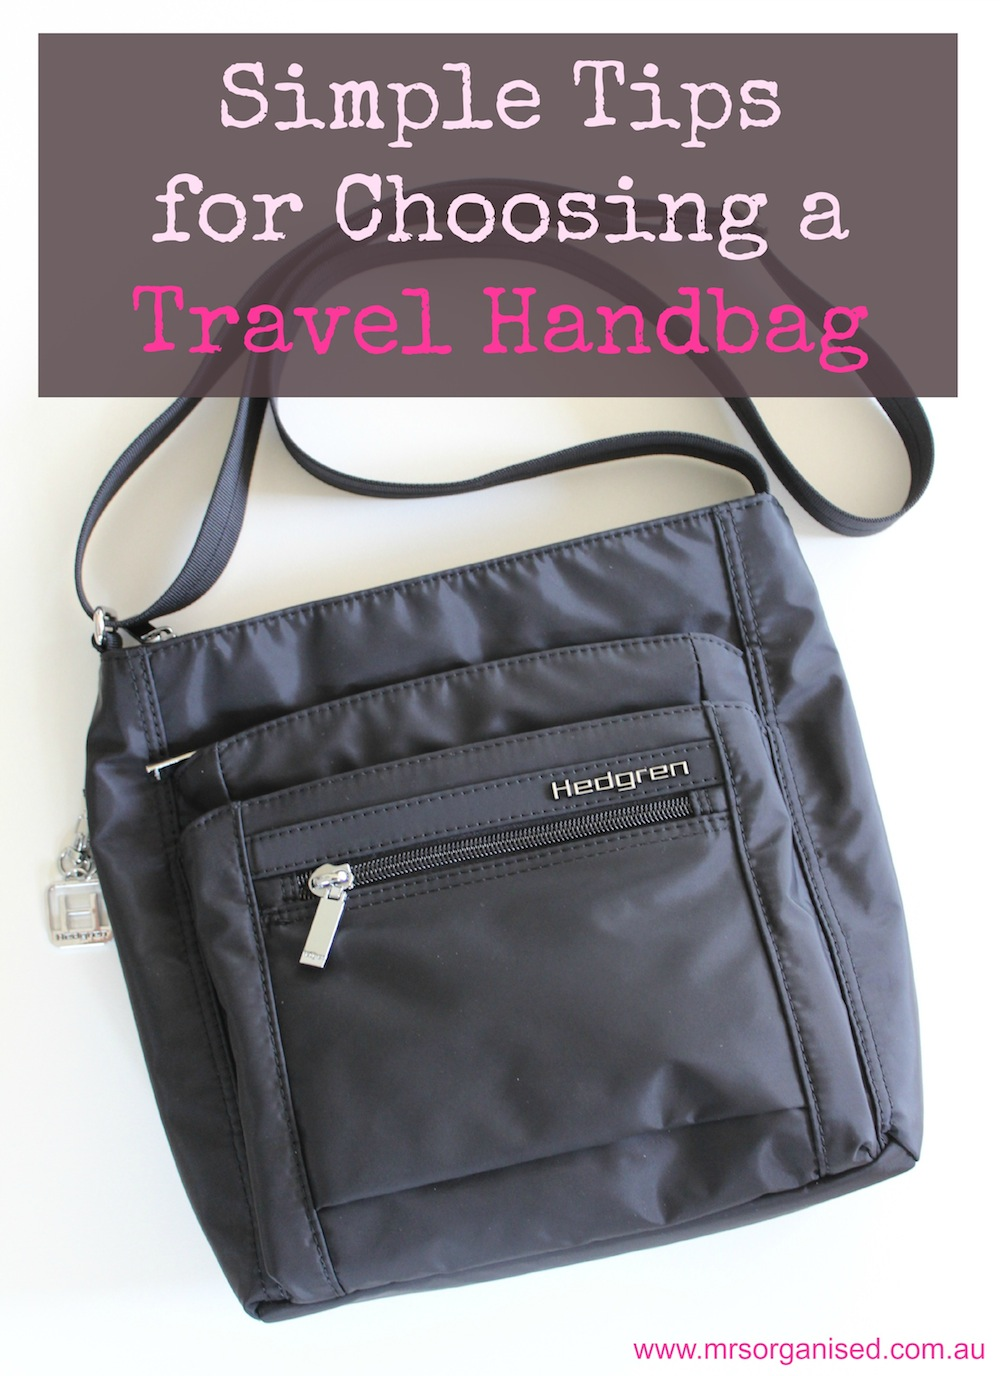 Simple Tips for Choosing a Travel Handbag 001